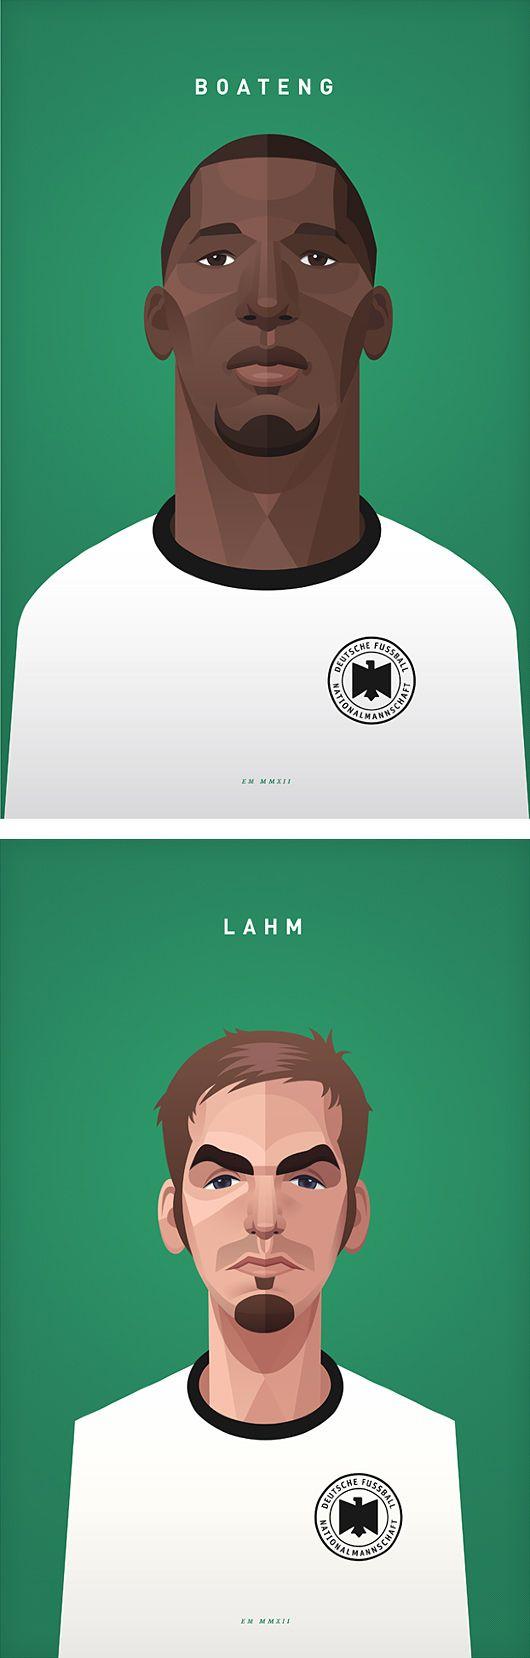 Cool Illustrations by Daniel Nyari | Inspiration Grid | Design Inspiration